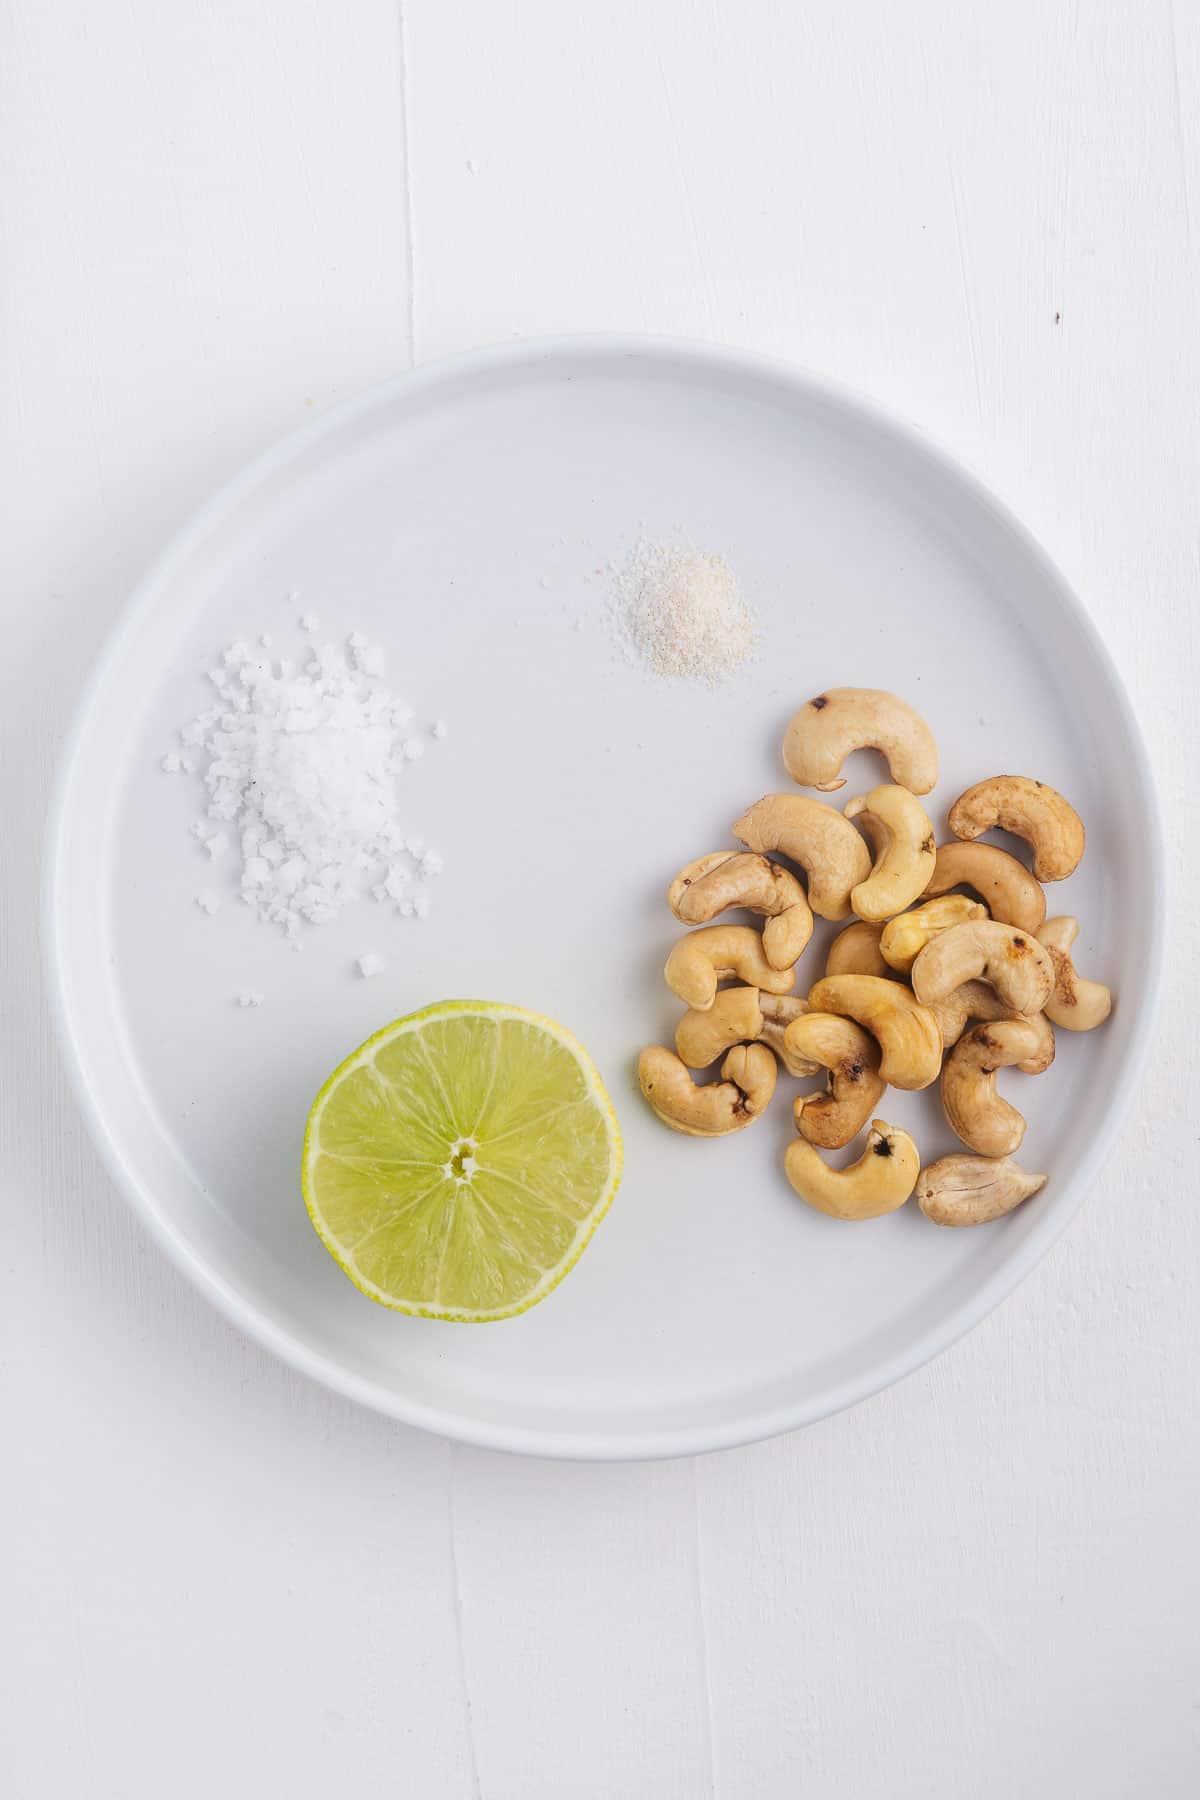 Cashews, Salt, Onion Powder, and Lime